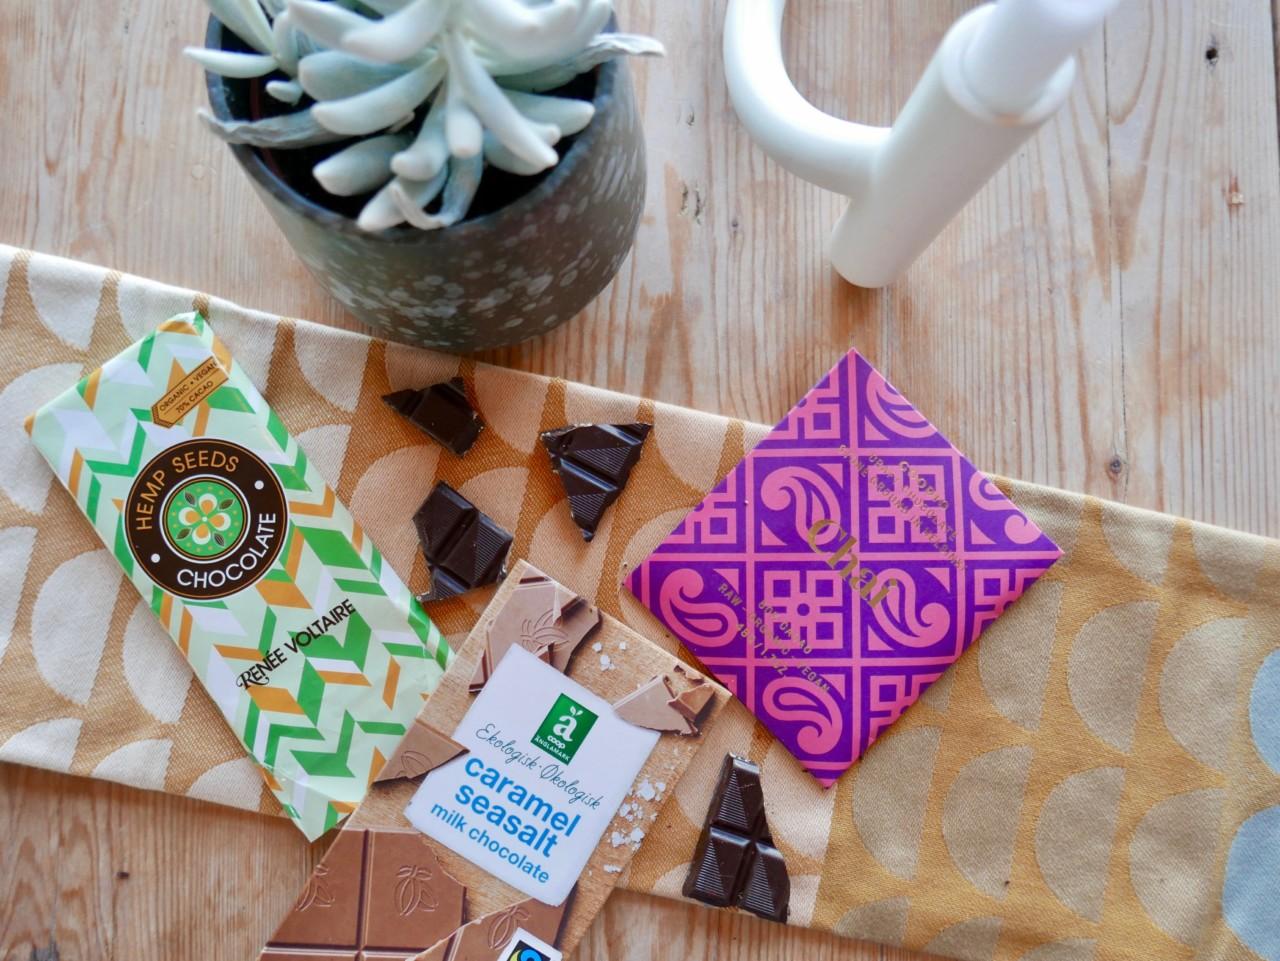 okologisk-sjokolade-renee-voltaire-goodio-anglamark